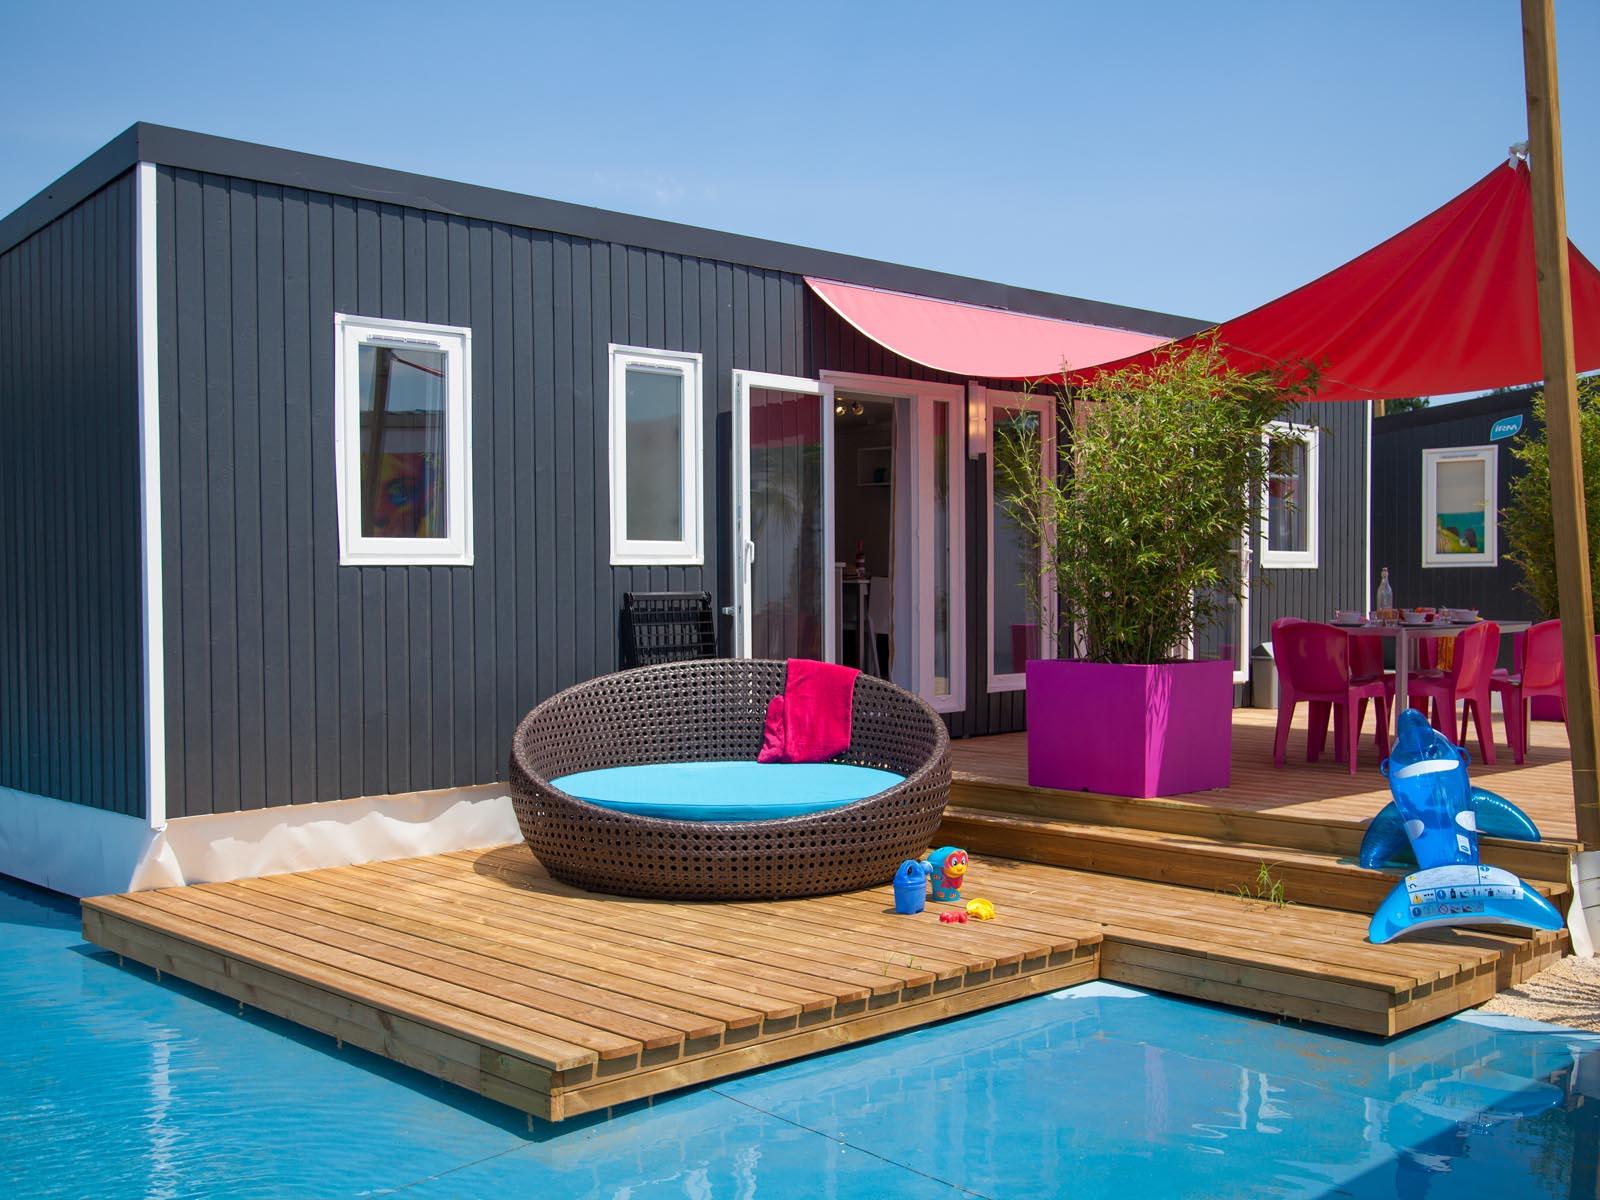 Mobilhome haut de gamme et piscine